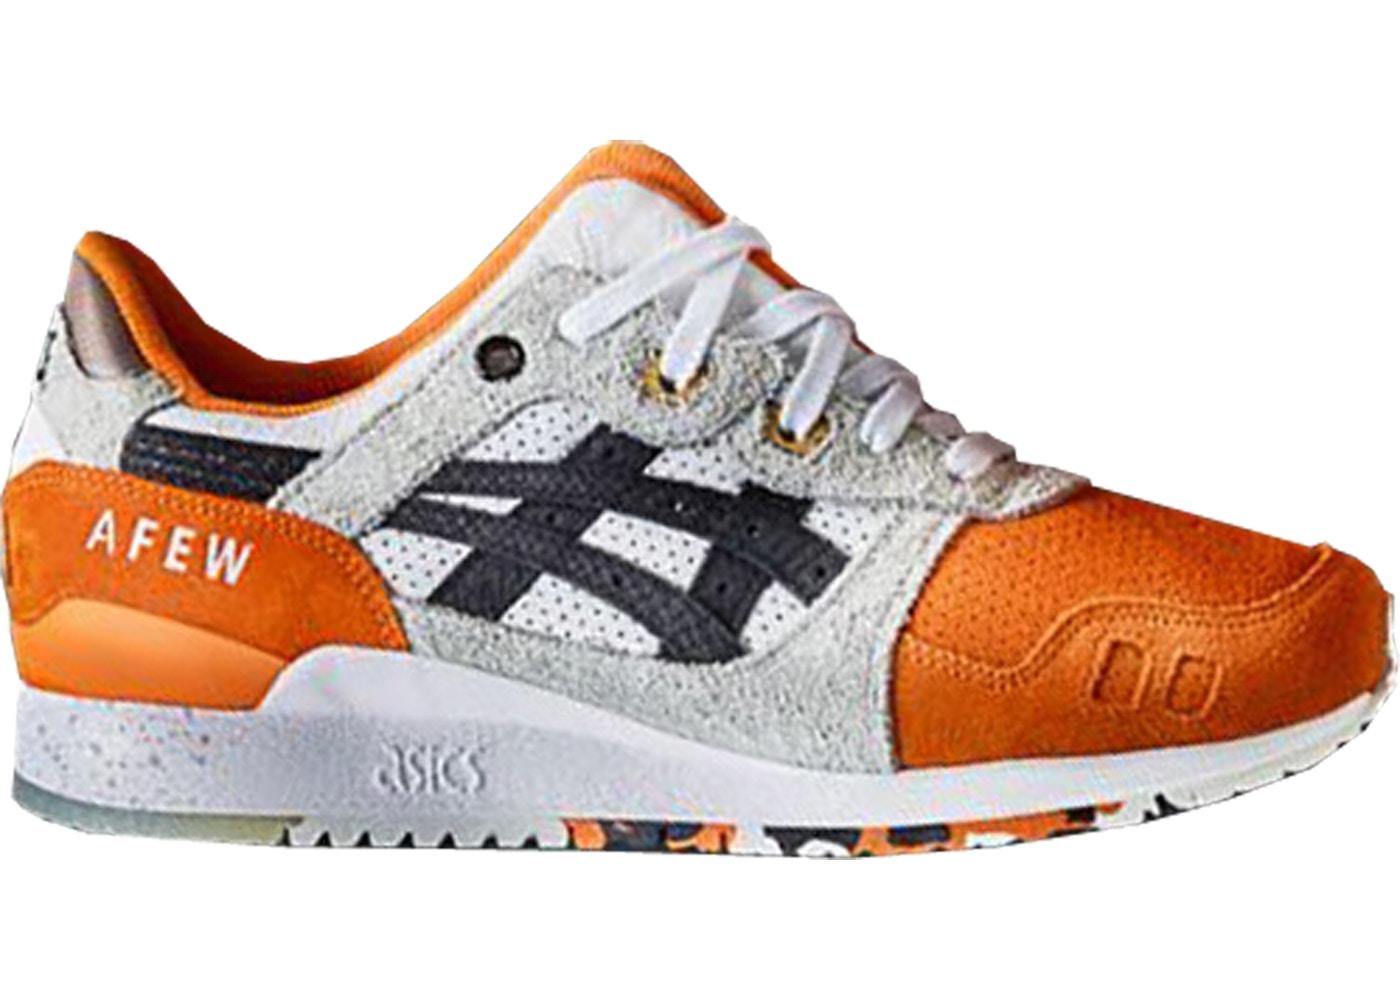 sports shoes 75c2e ddb4c Asics Tiger Gel-Lyte Iii X Afew X Beams | Release Plug